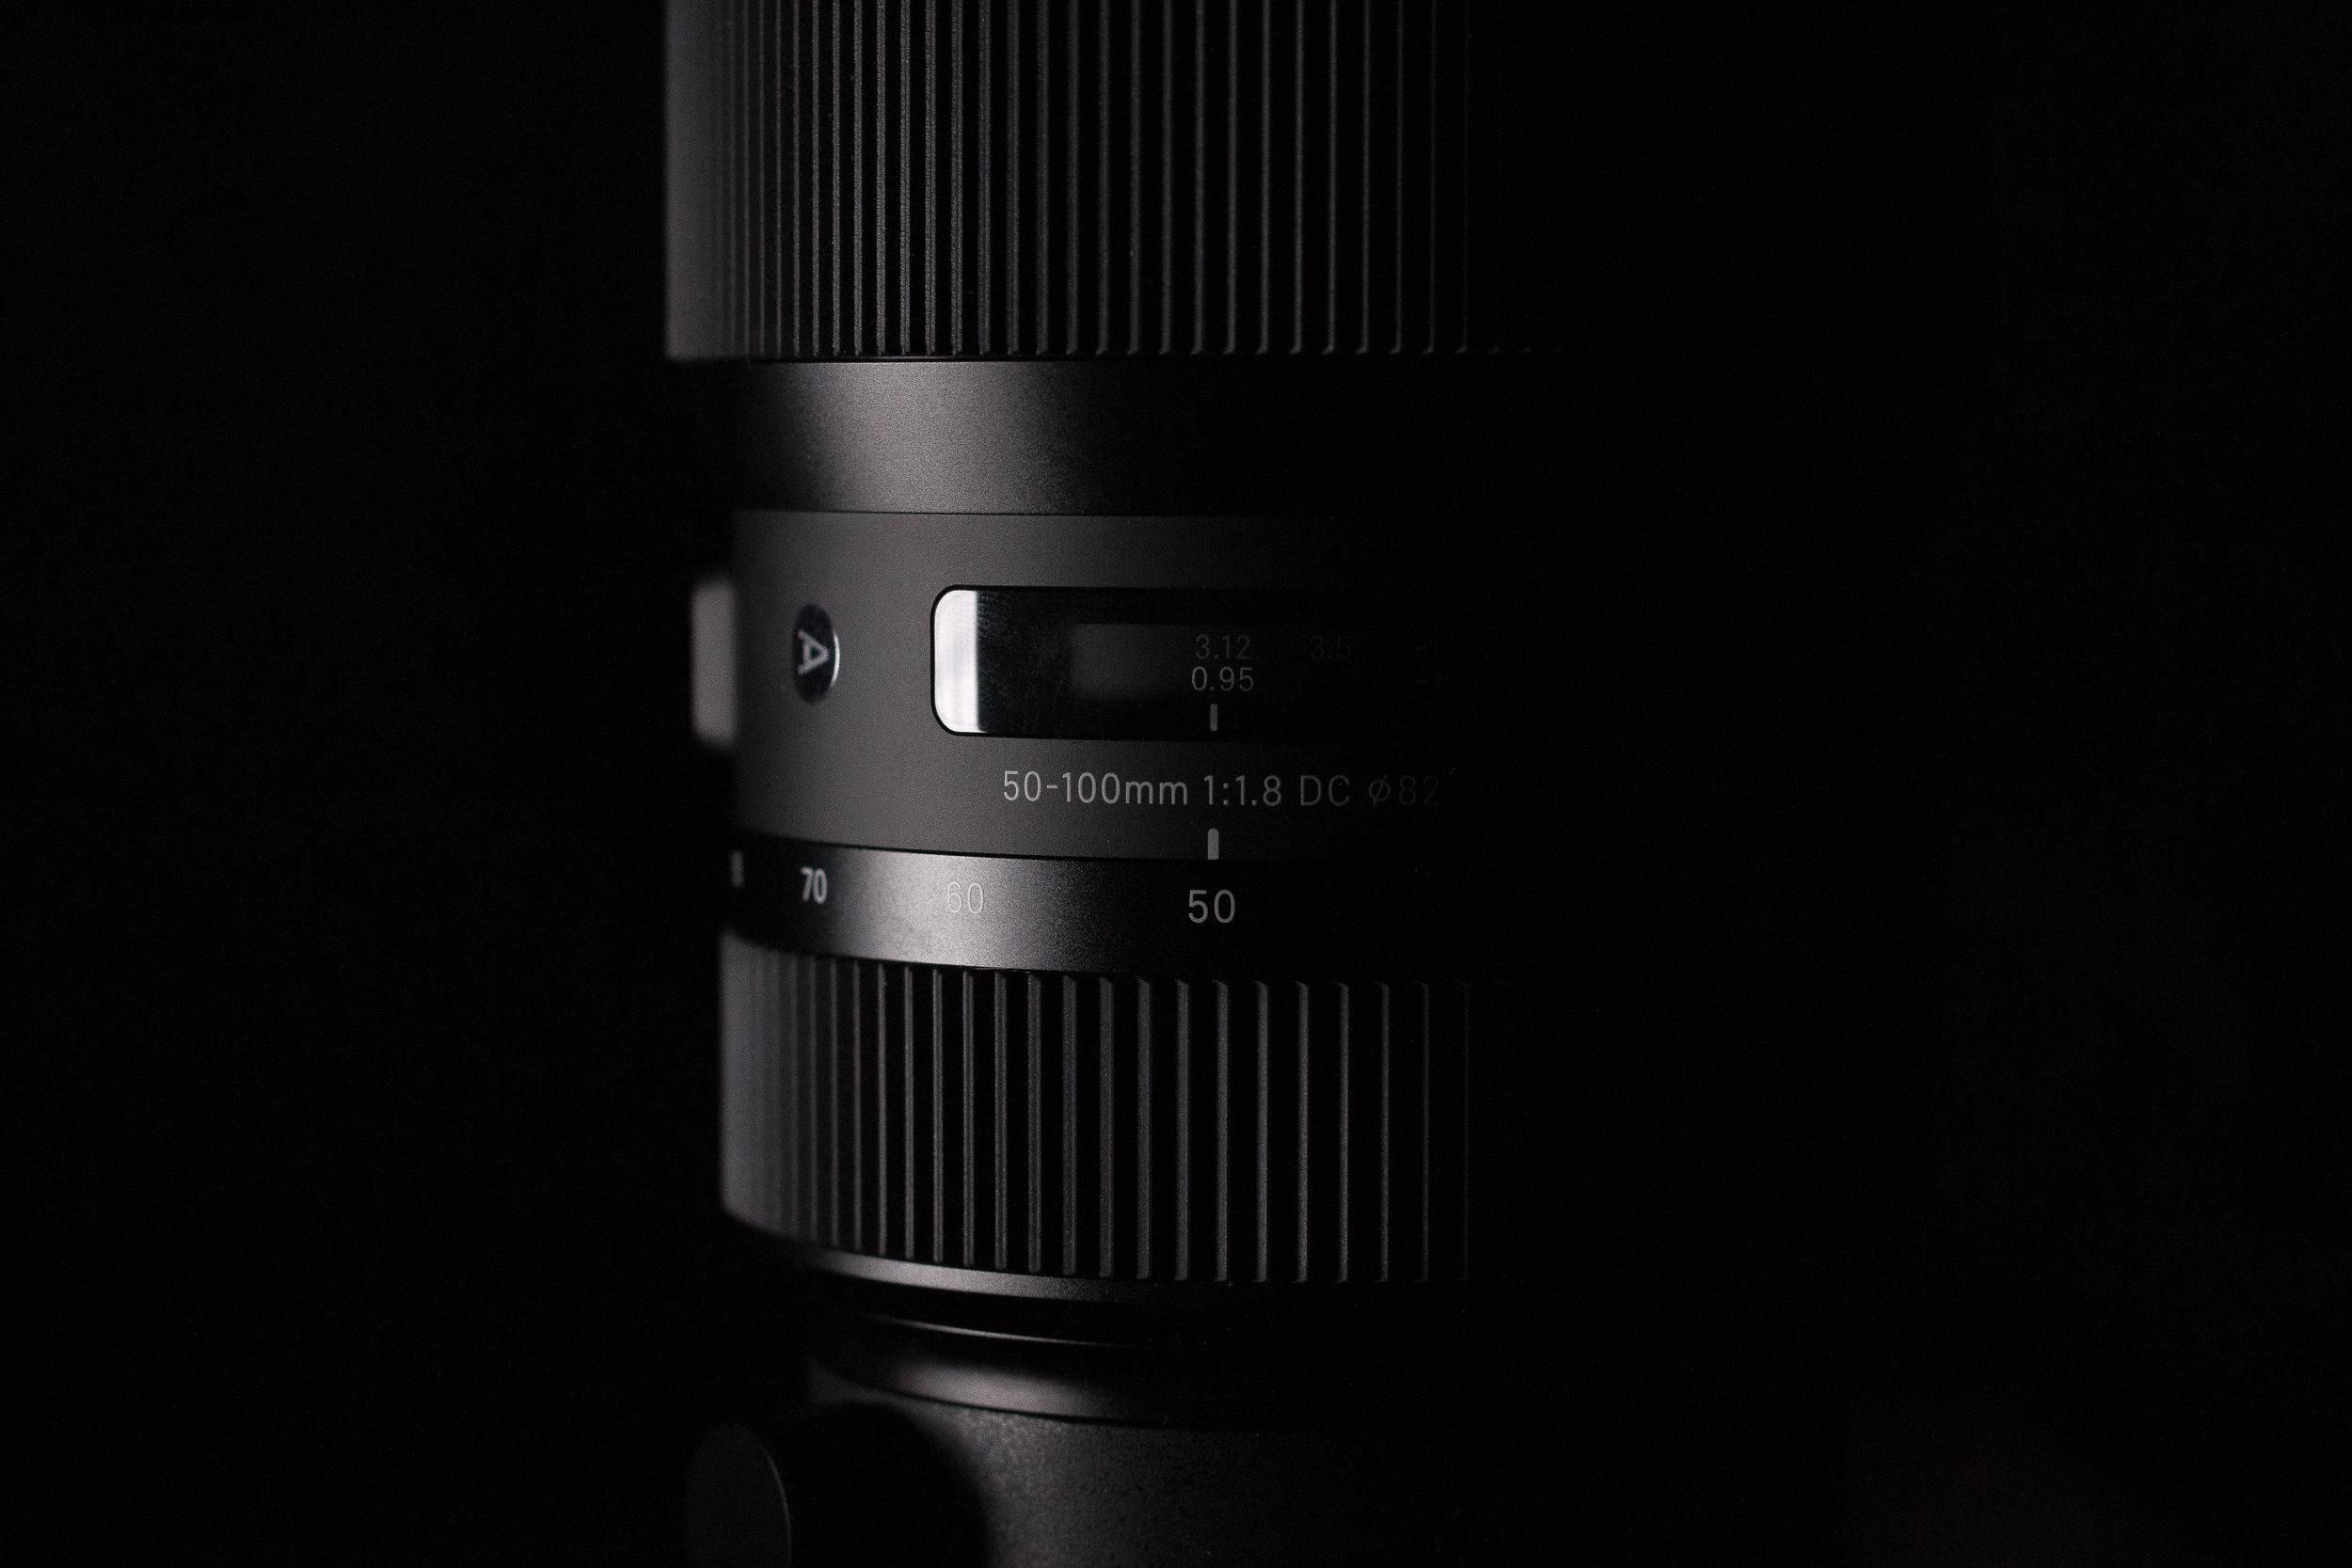 Sigma 50-100 F1.8 HSM Art